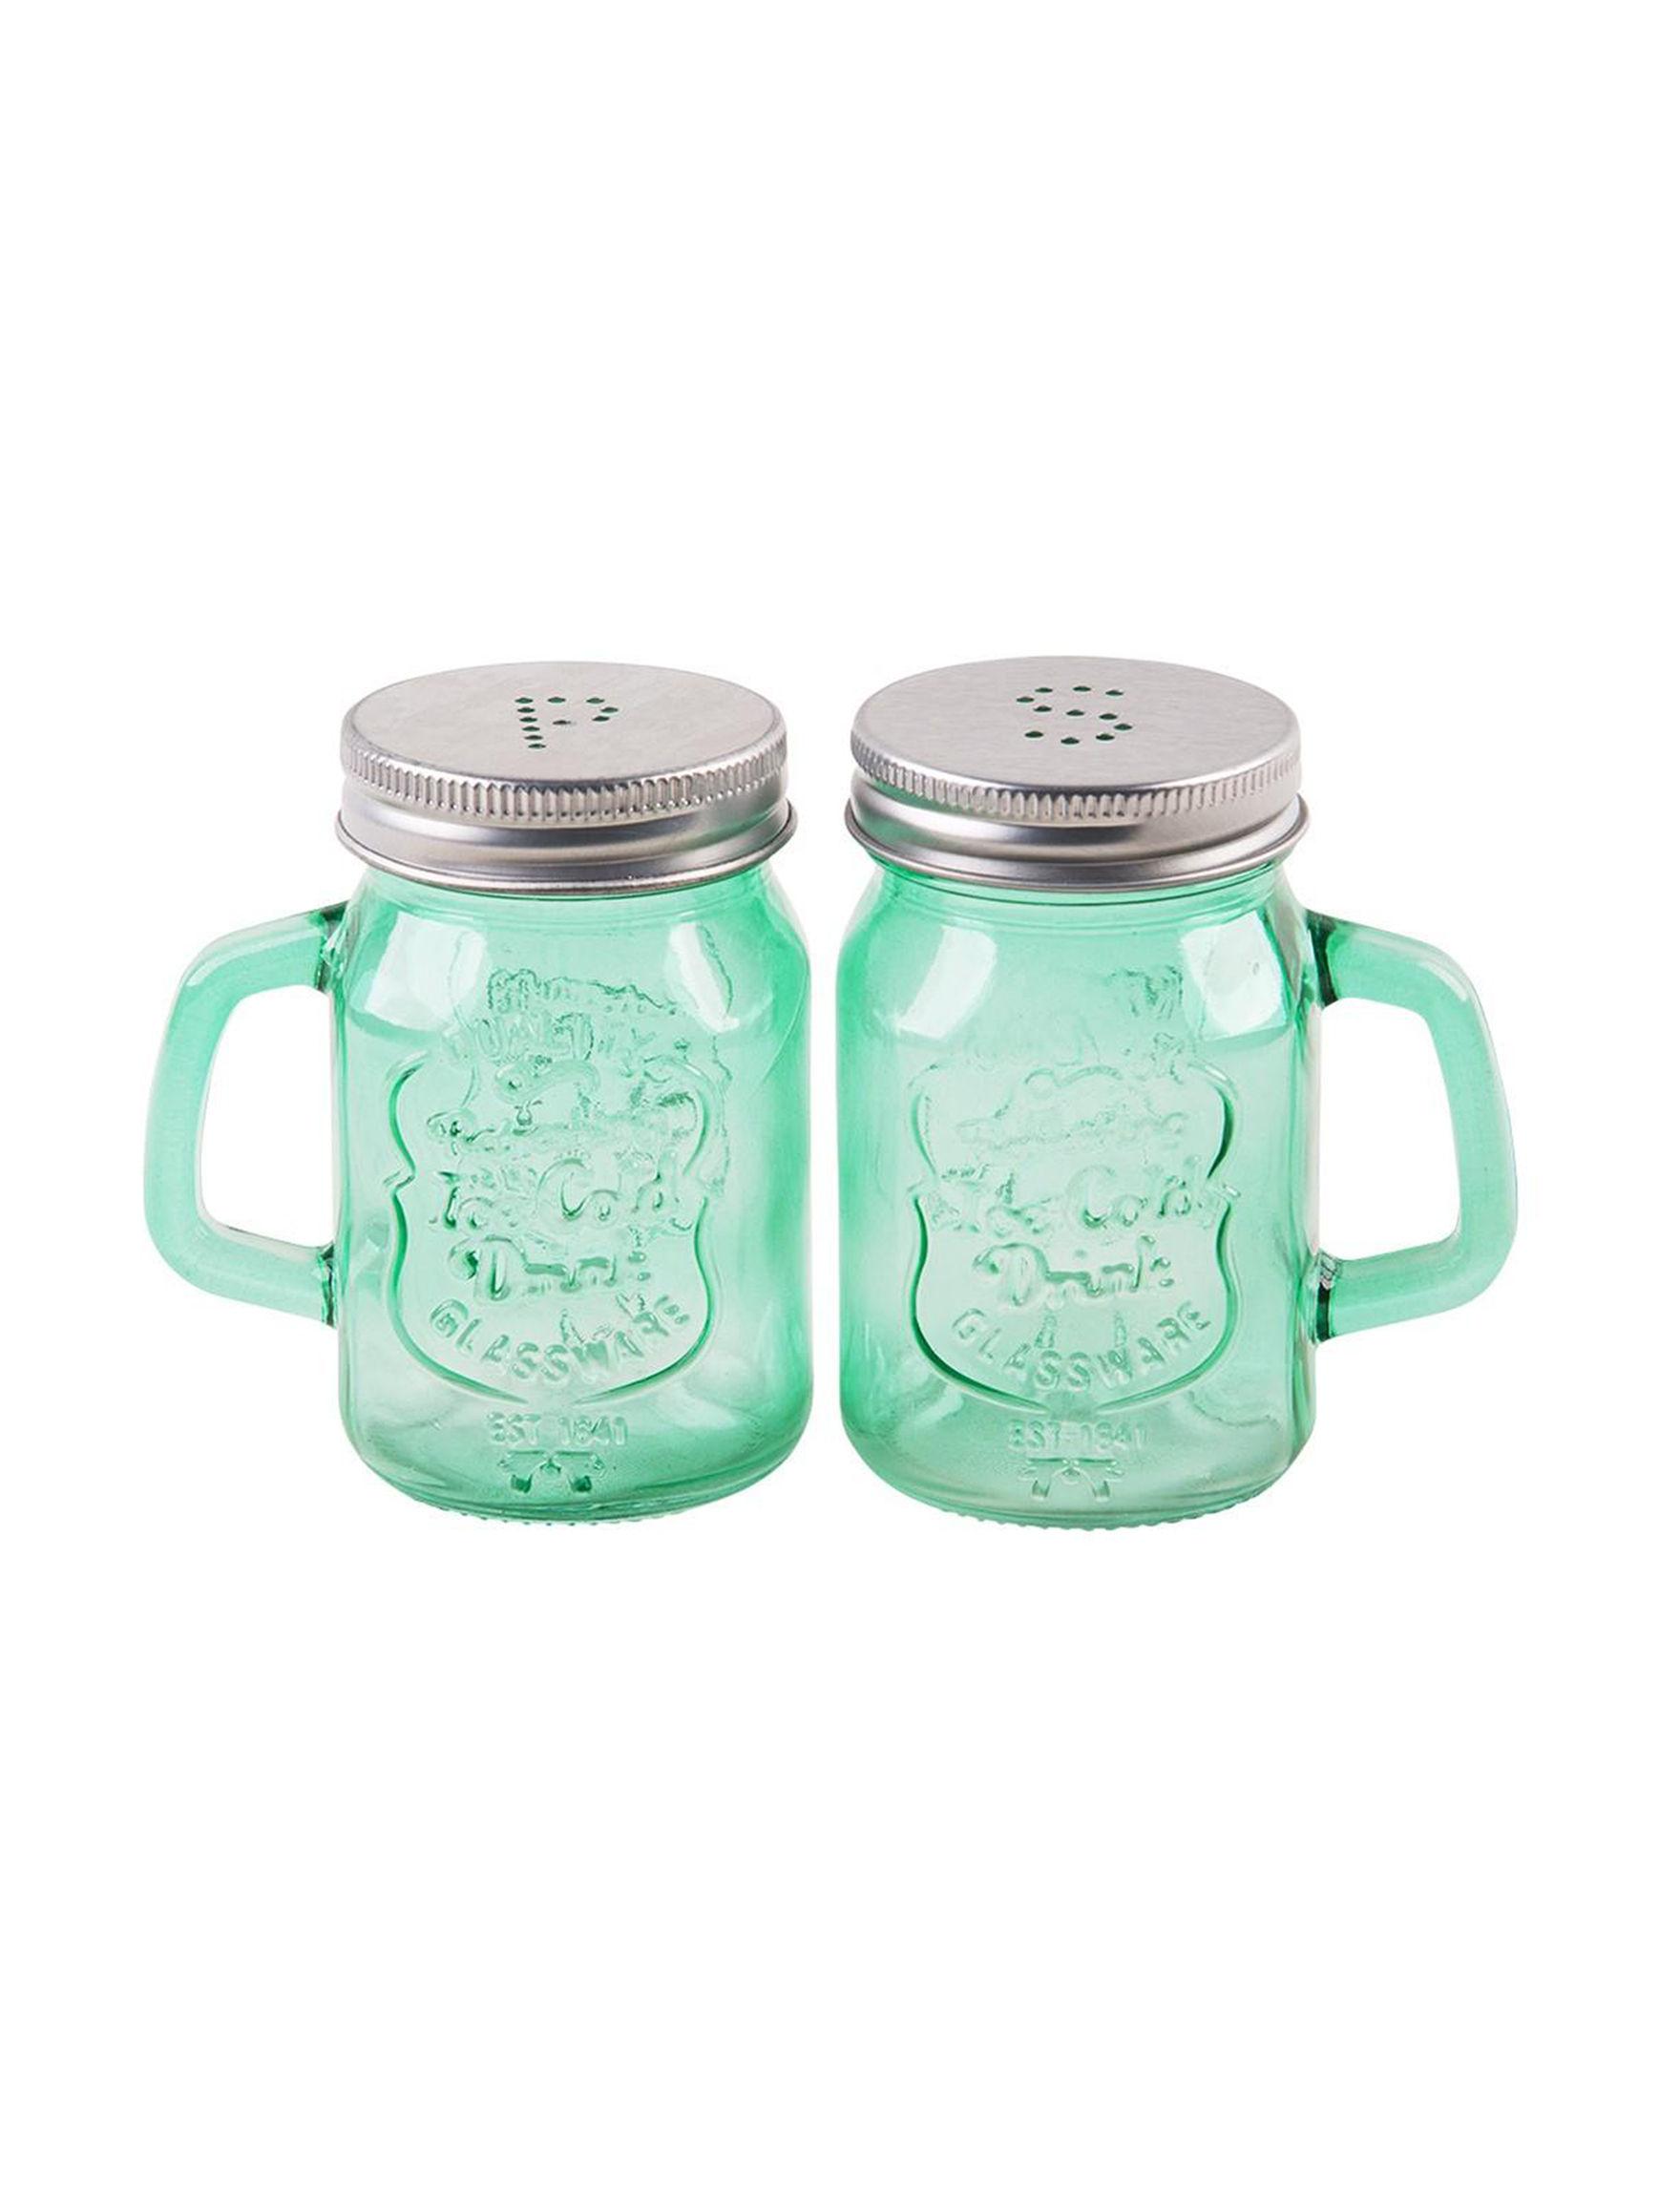 Home Essentials Green Salt & Pepper Shakers Serveware